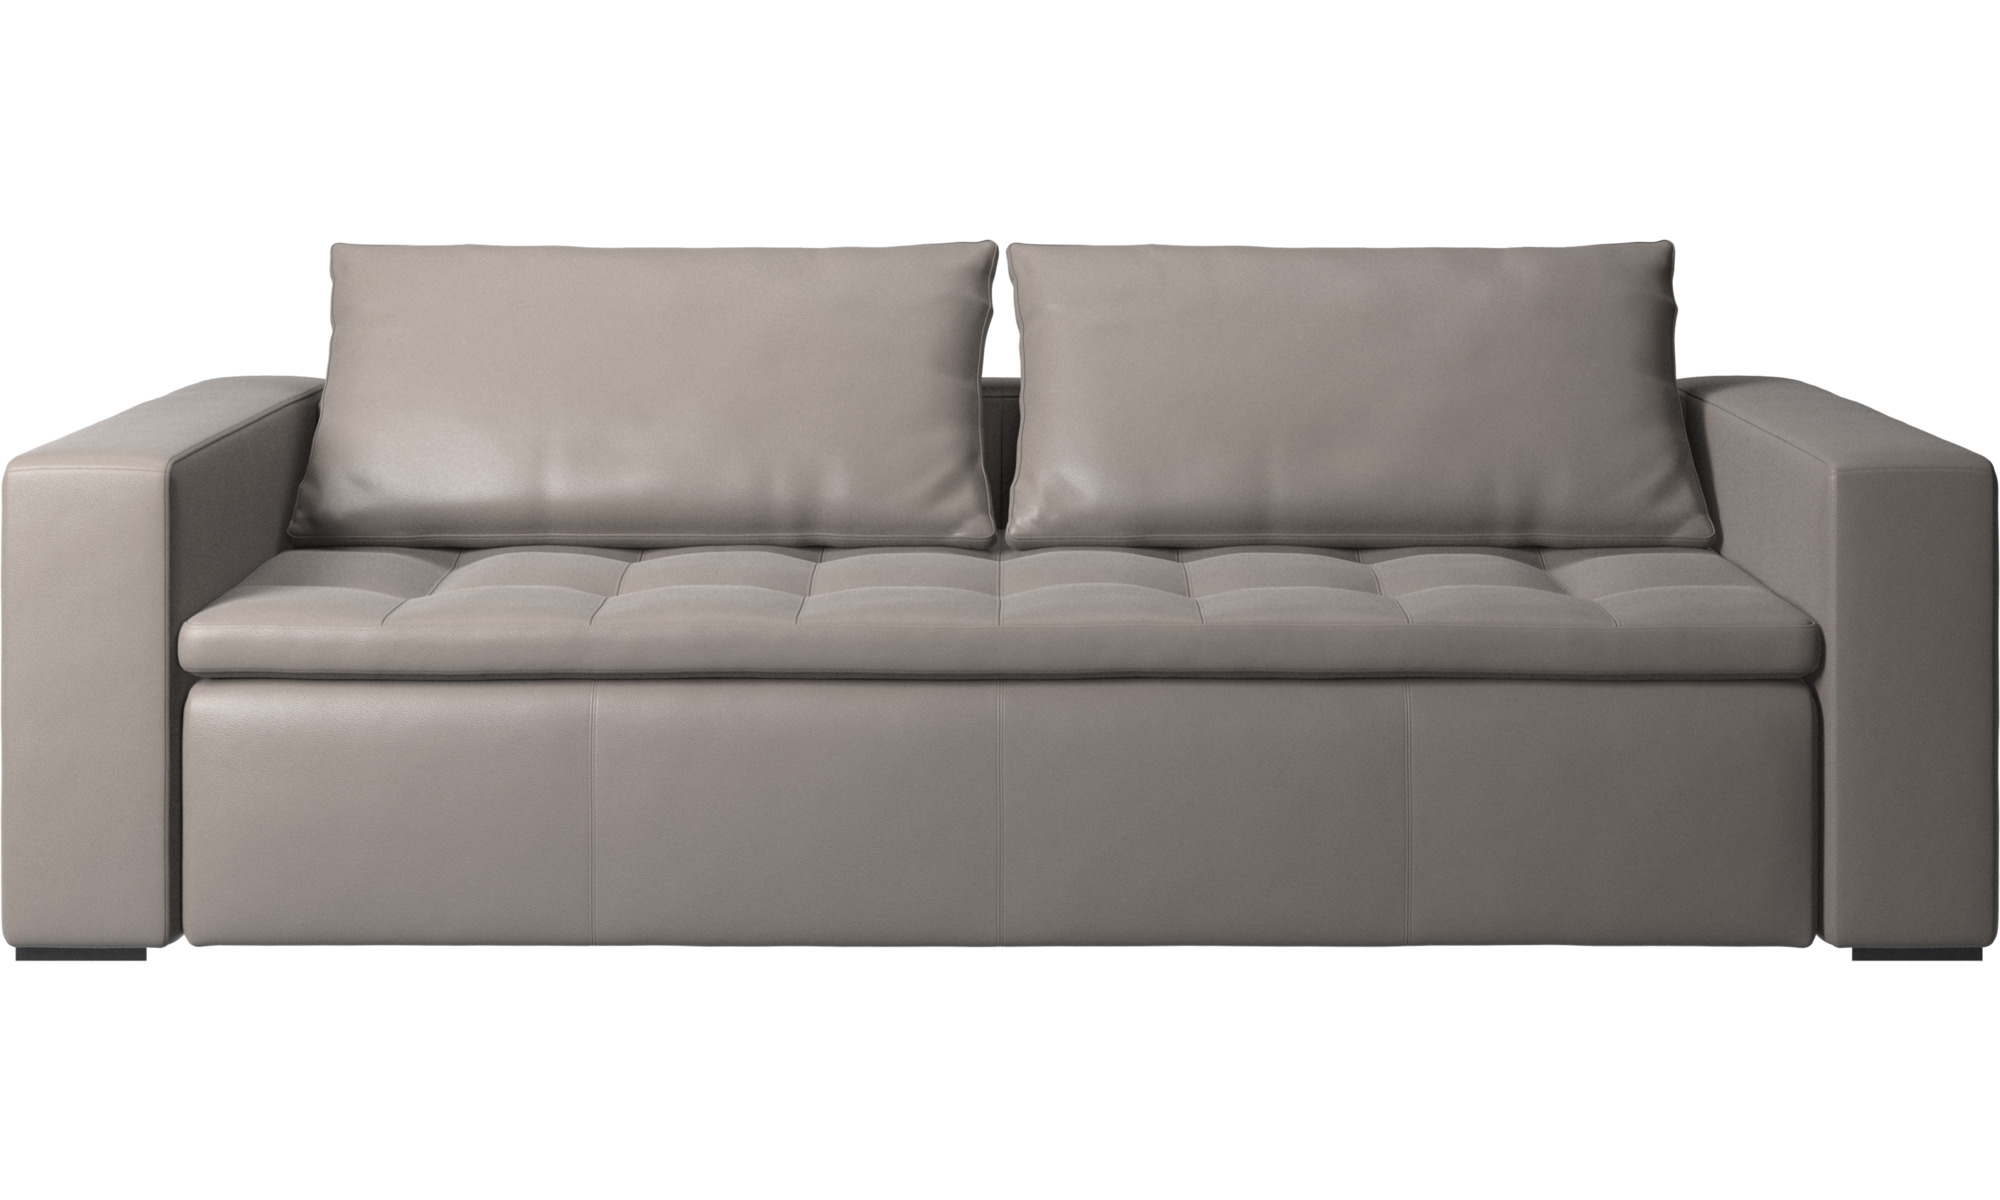 3 personers sofaer - Mezzo sofa - Beige - Læder